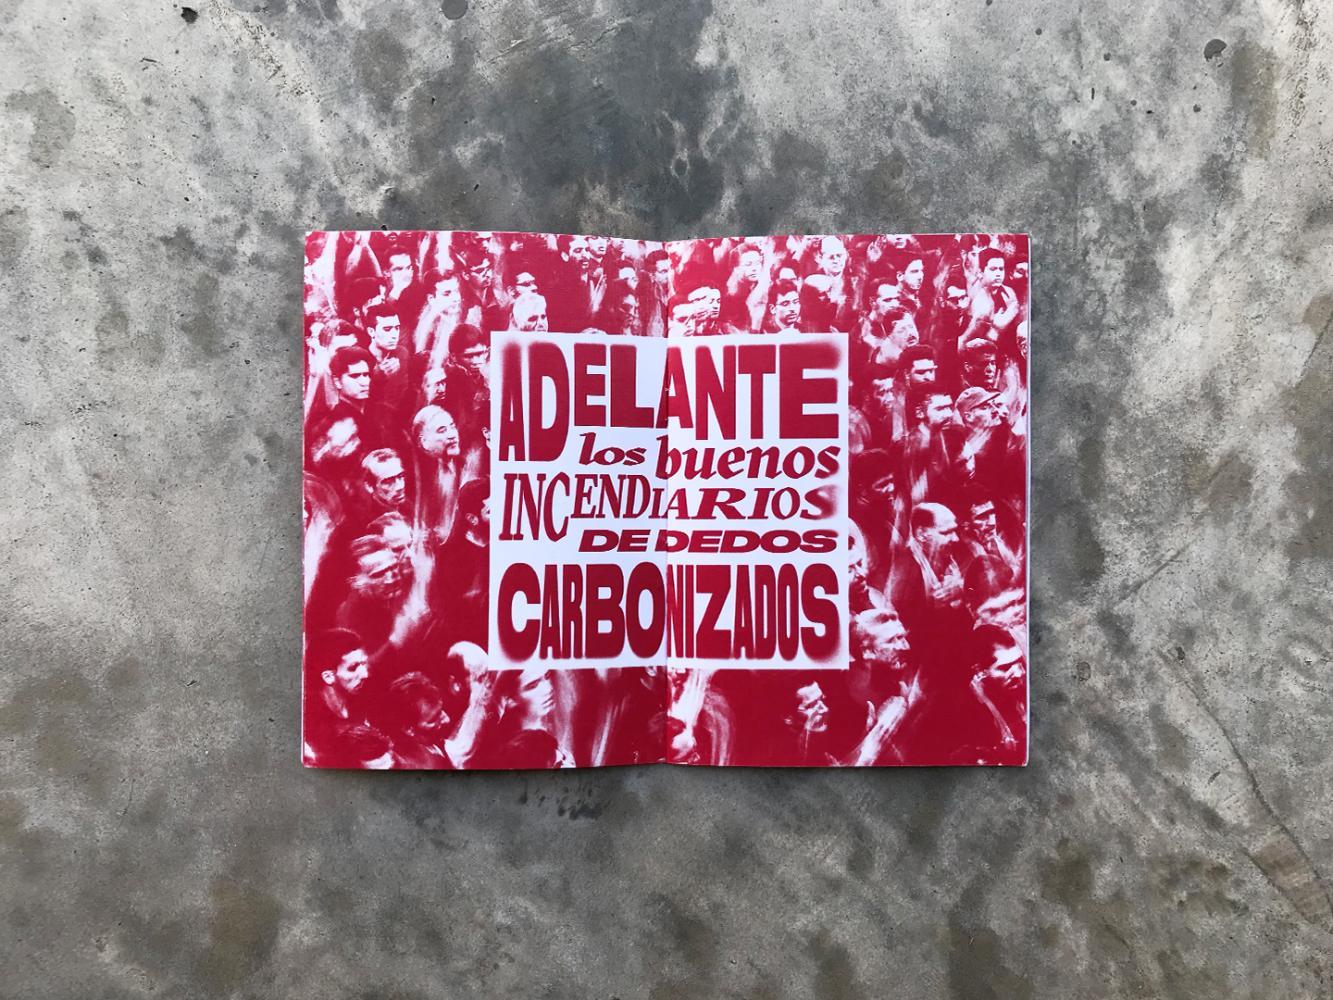 Robaldo Benjumeda Juan - Manfiesto Futurista 04